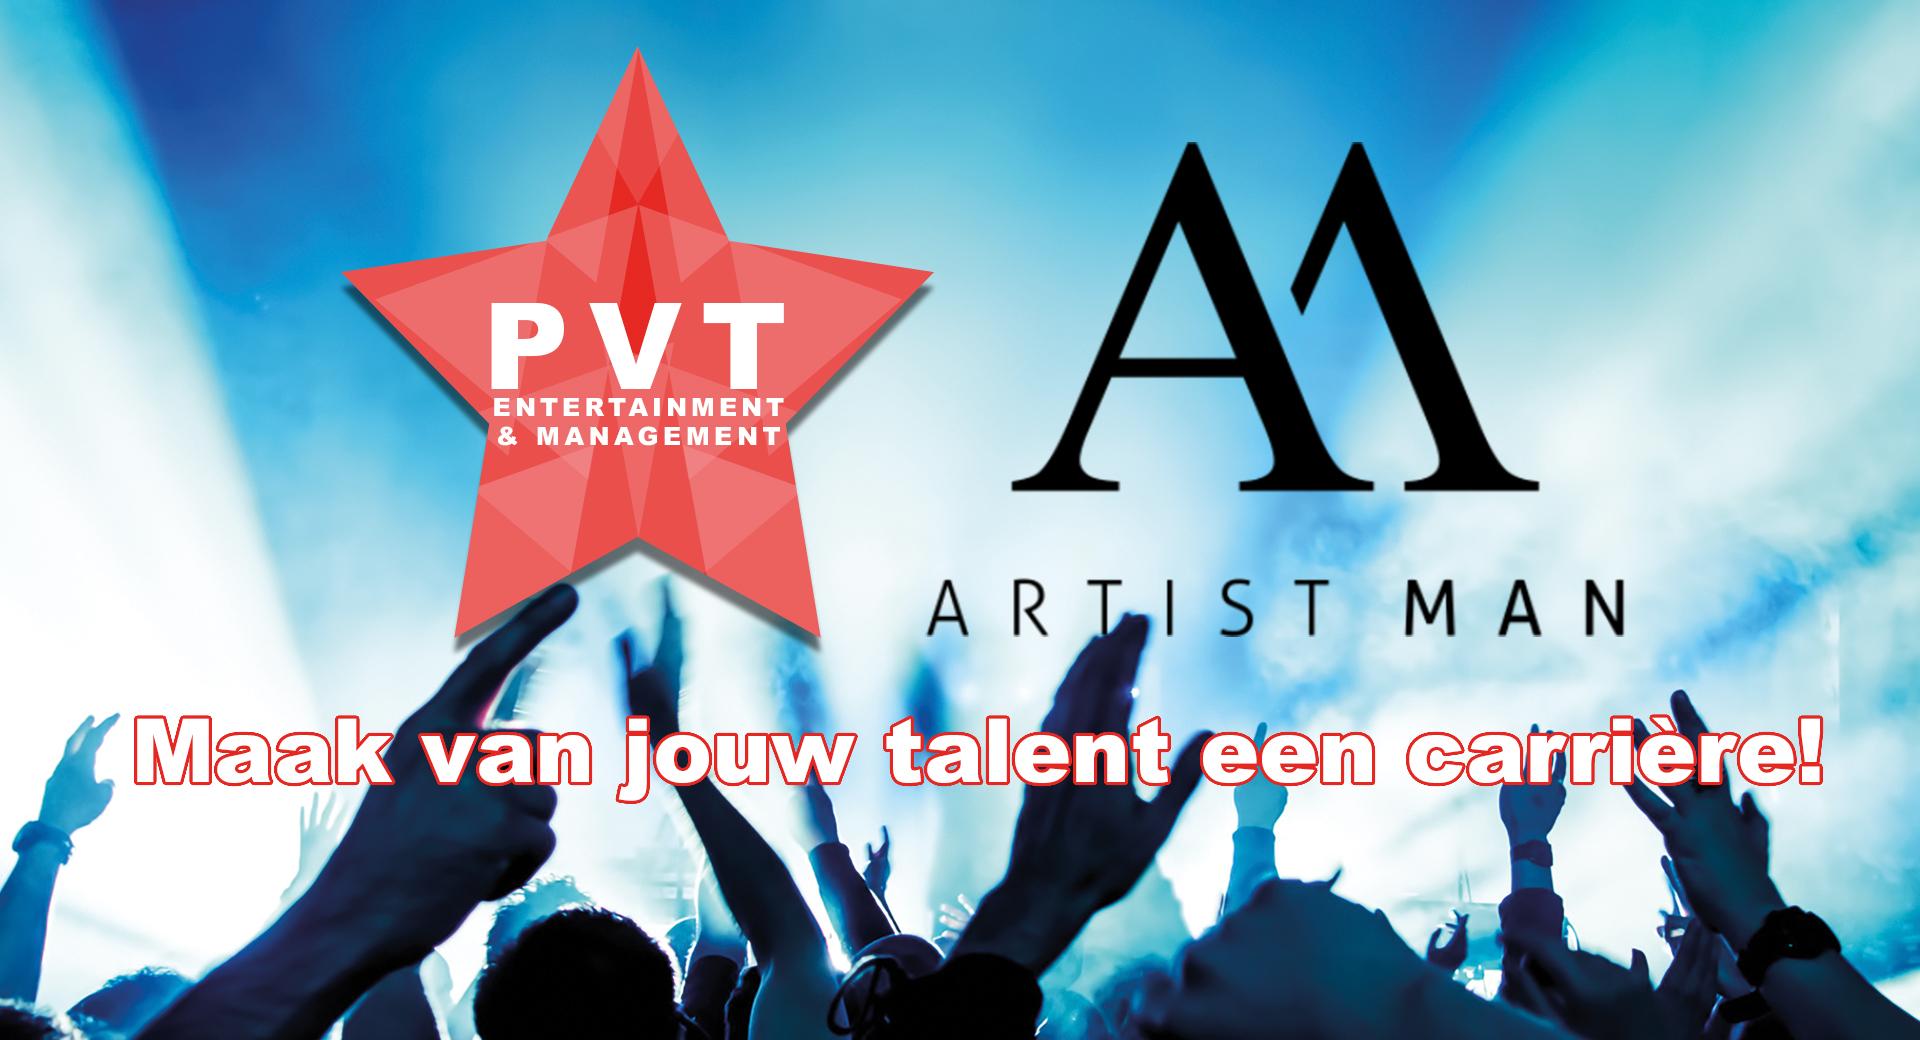 PVT neemt ArtistMan over